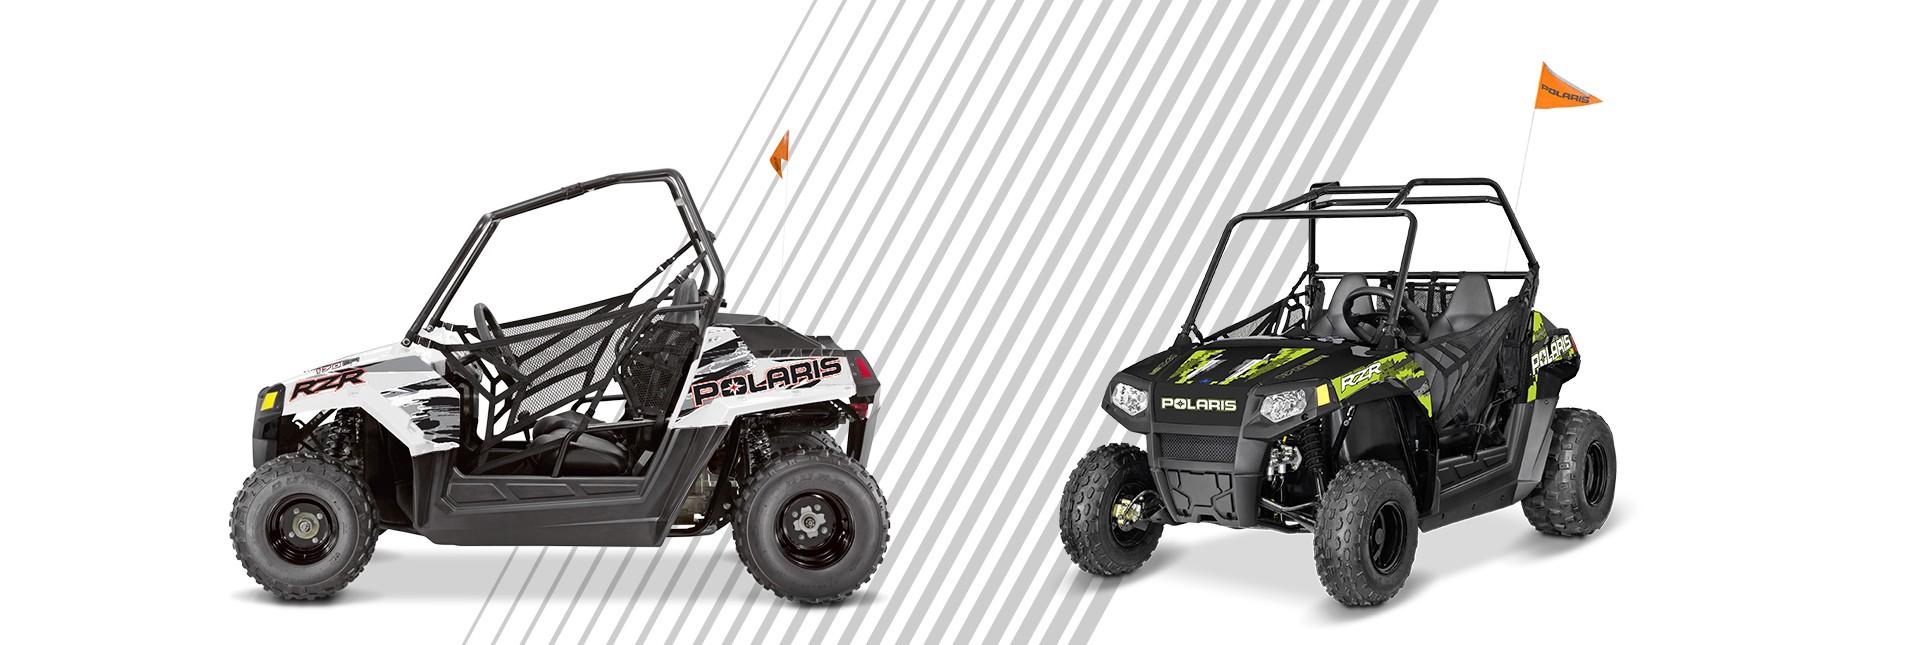 Polaris RZR: Sport Side by Sides (SxS)